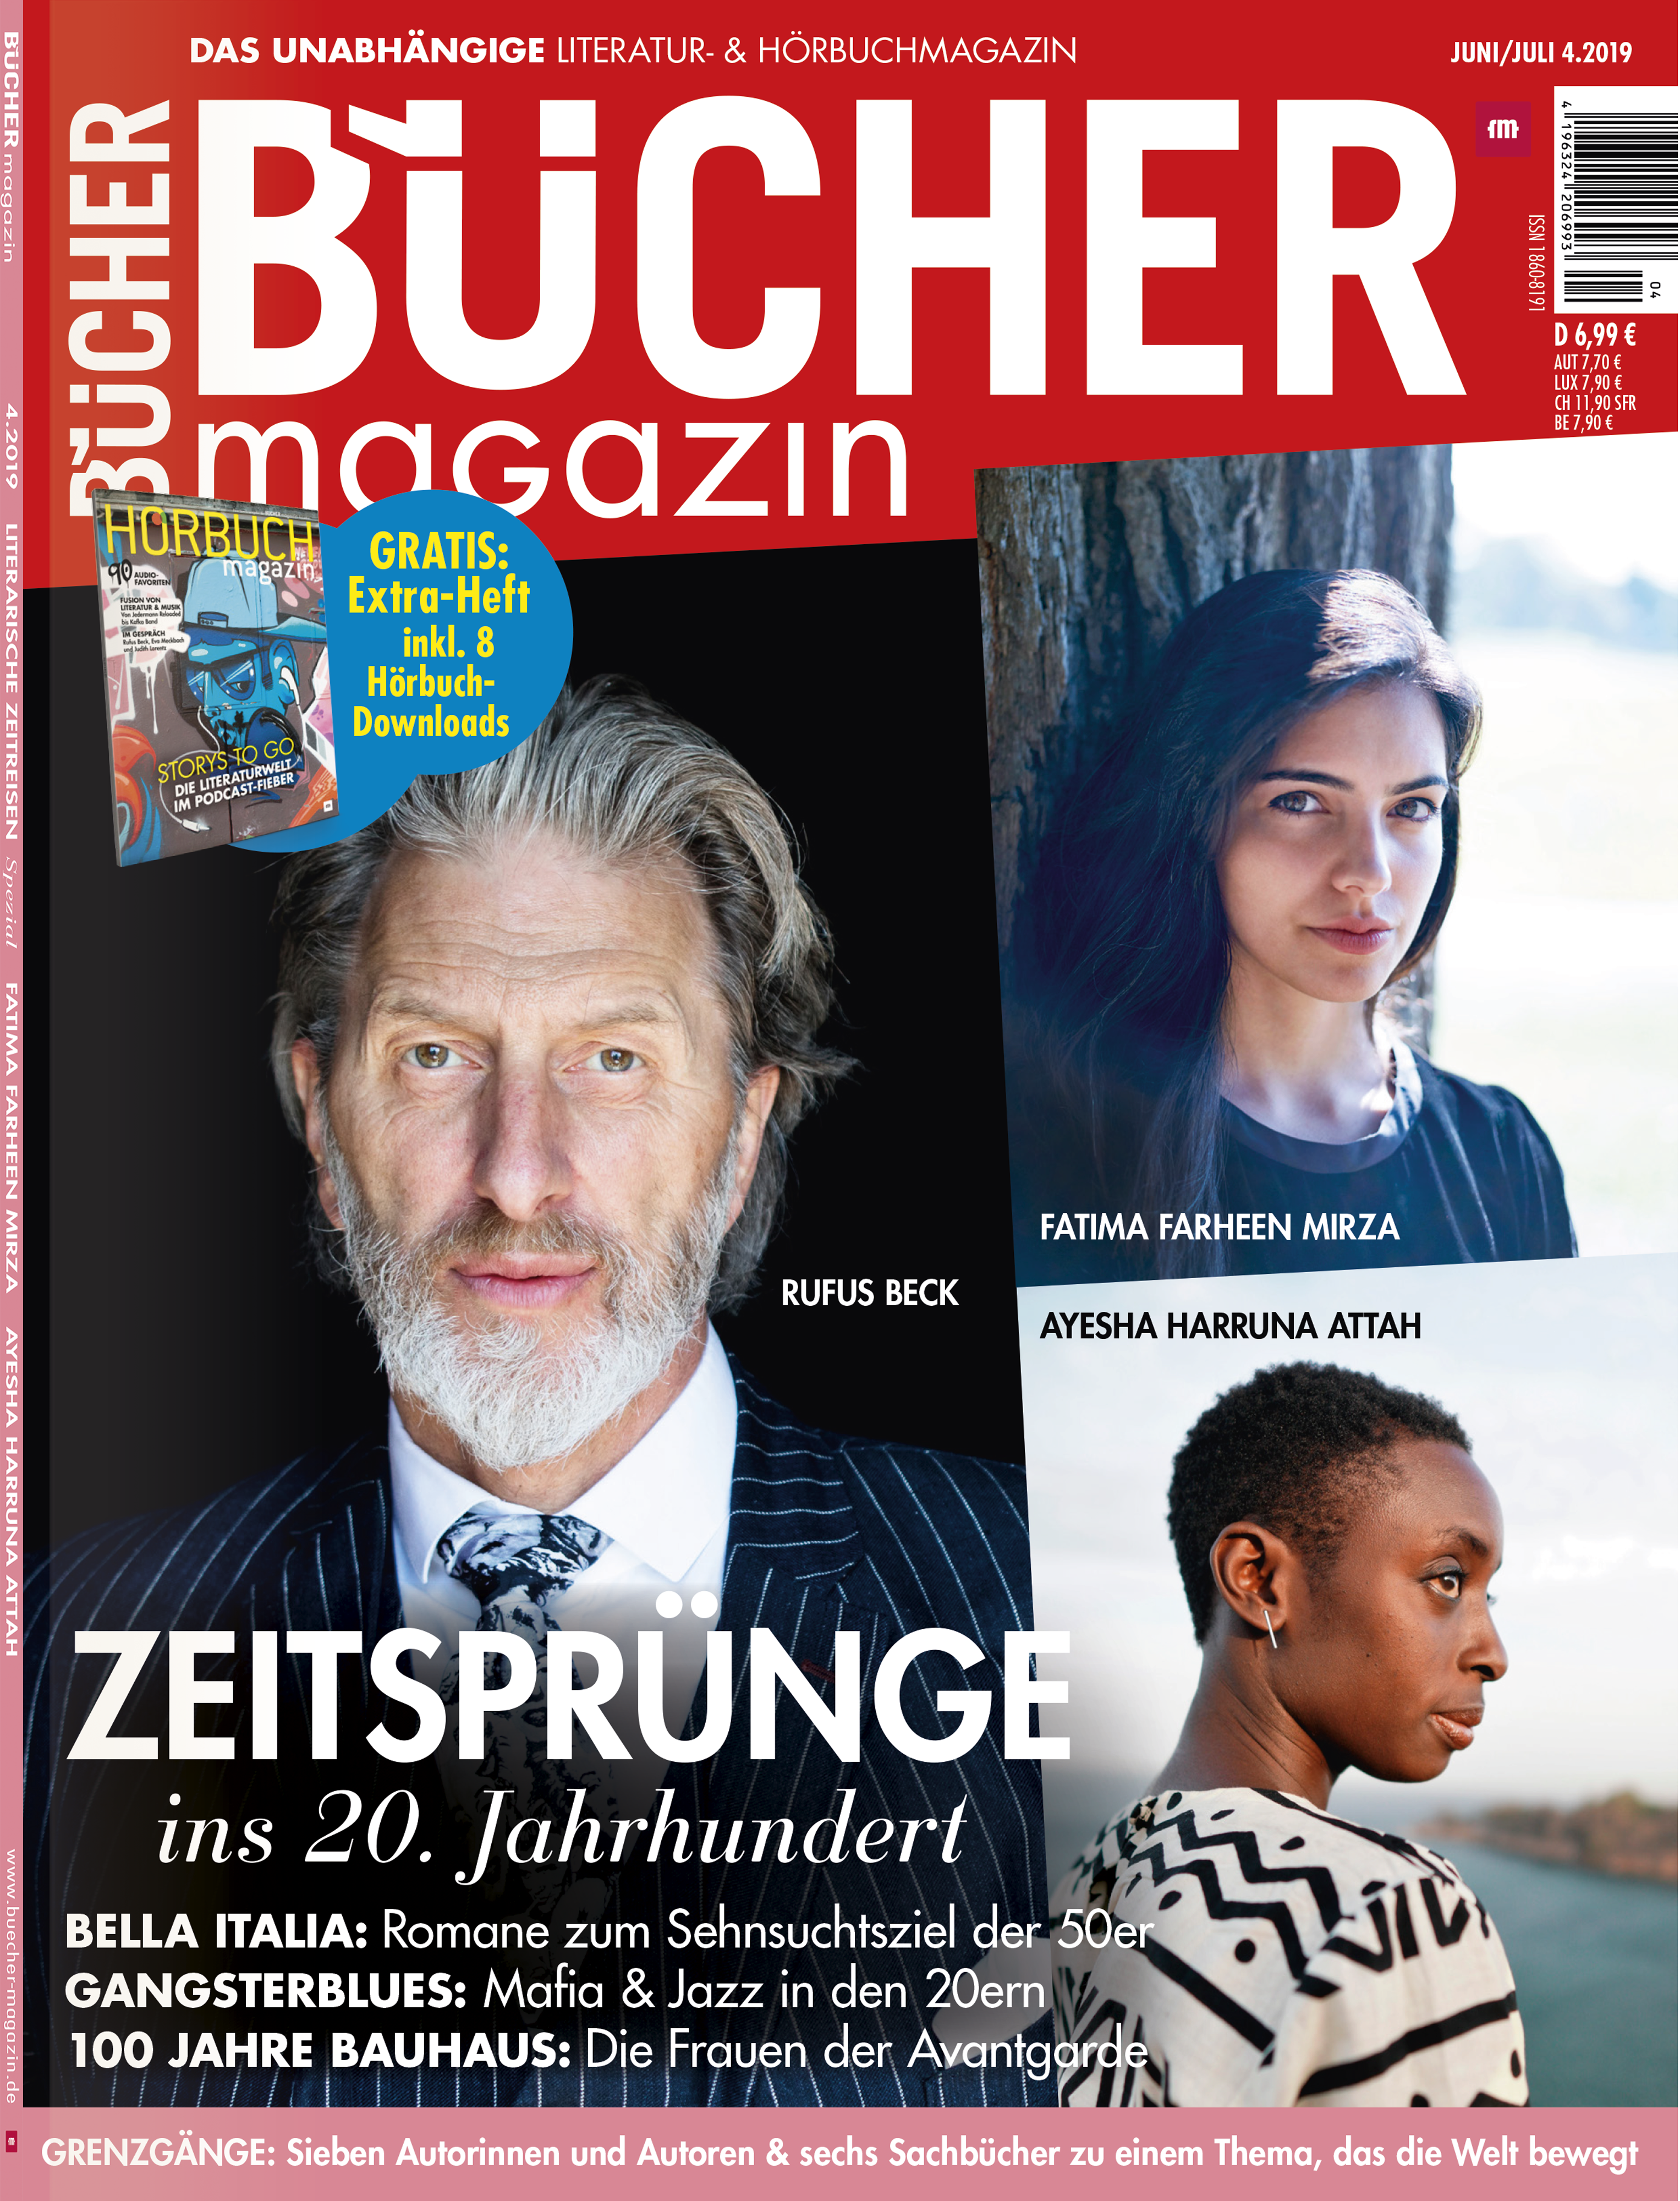 BÜCHER 04/2019